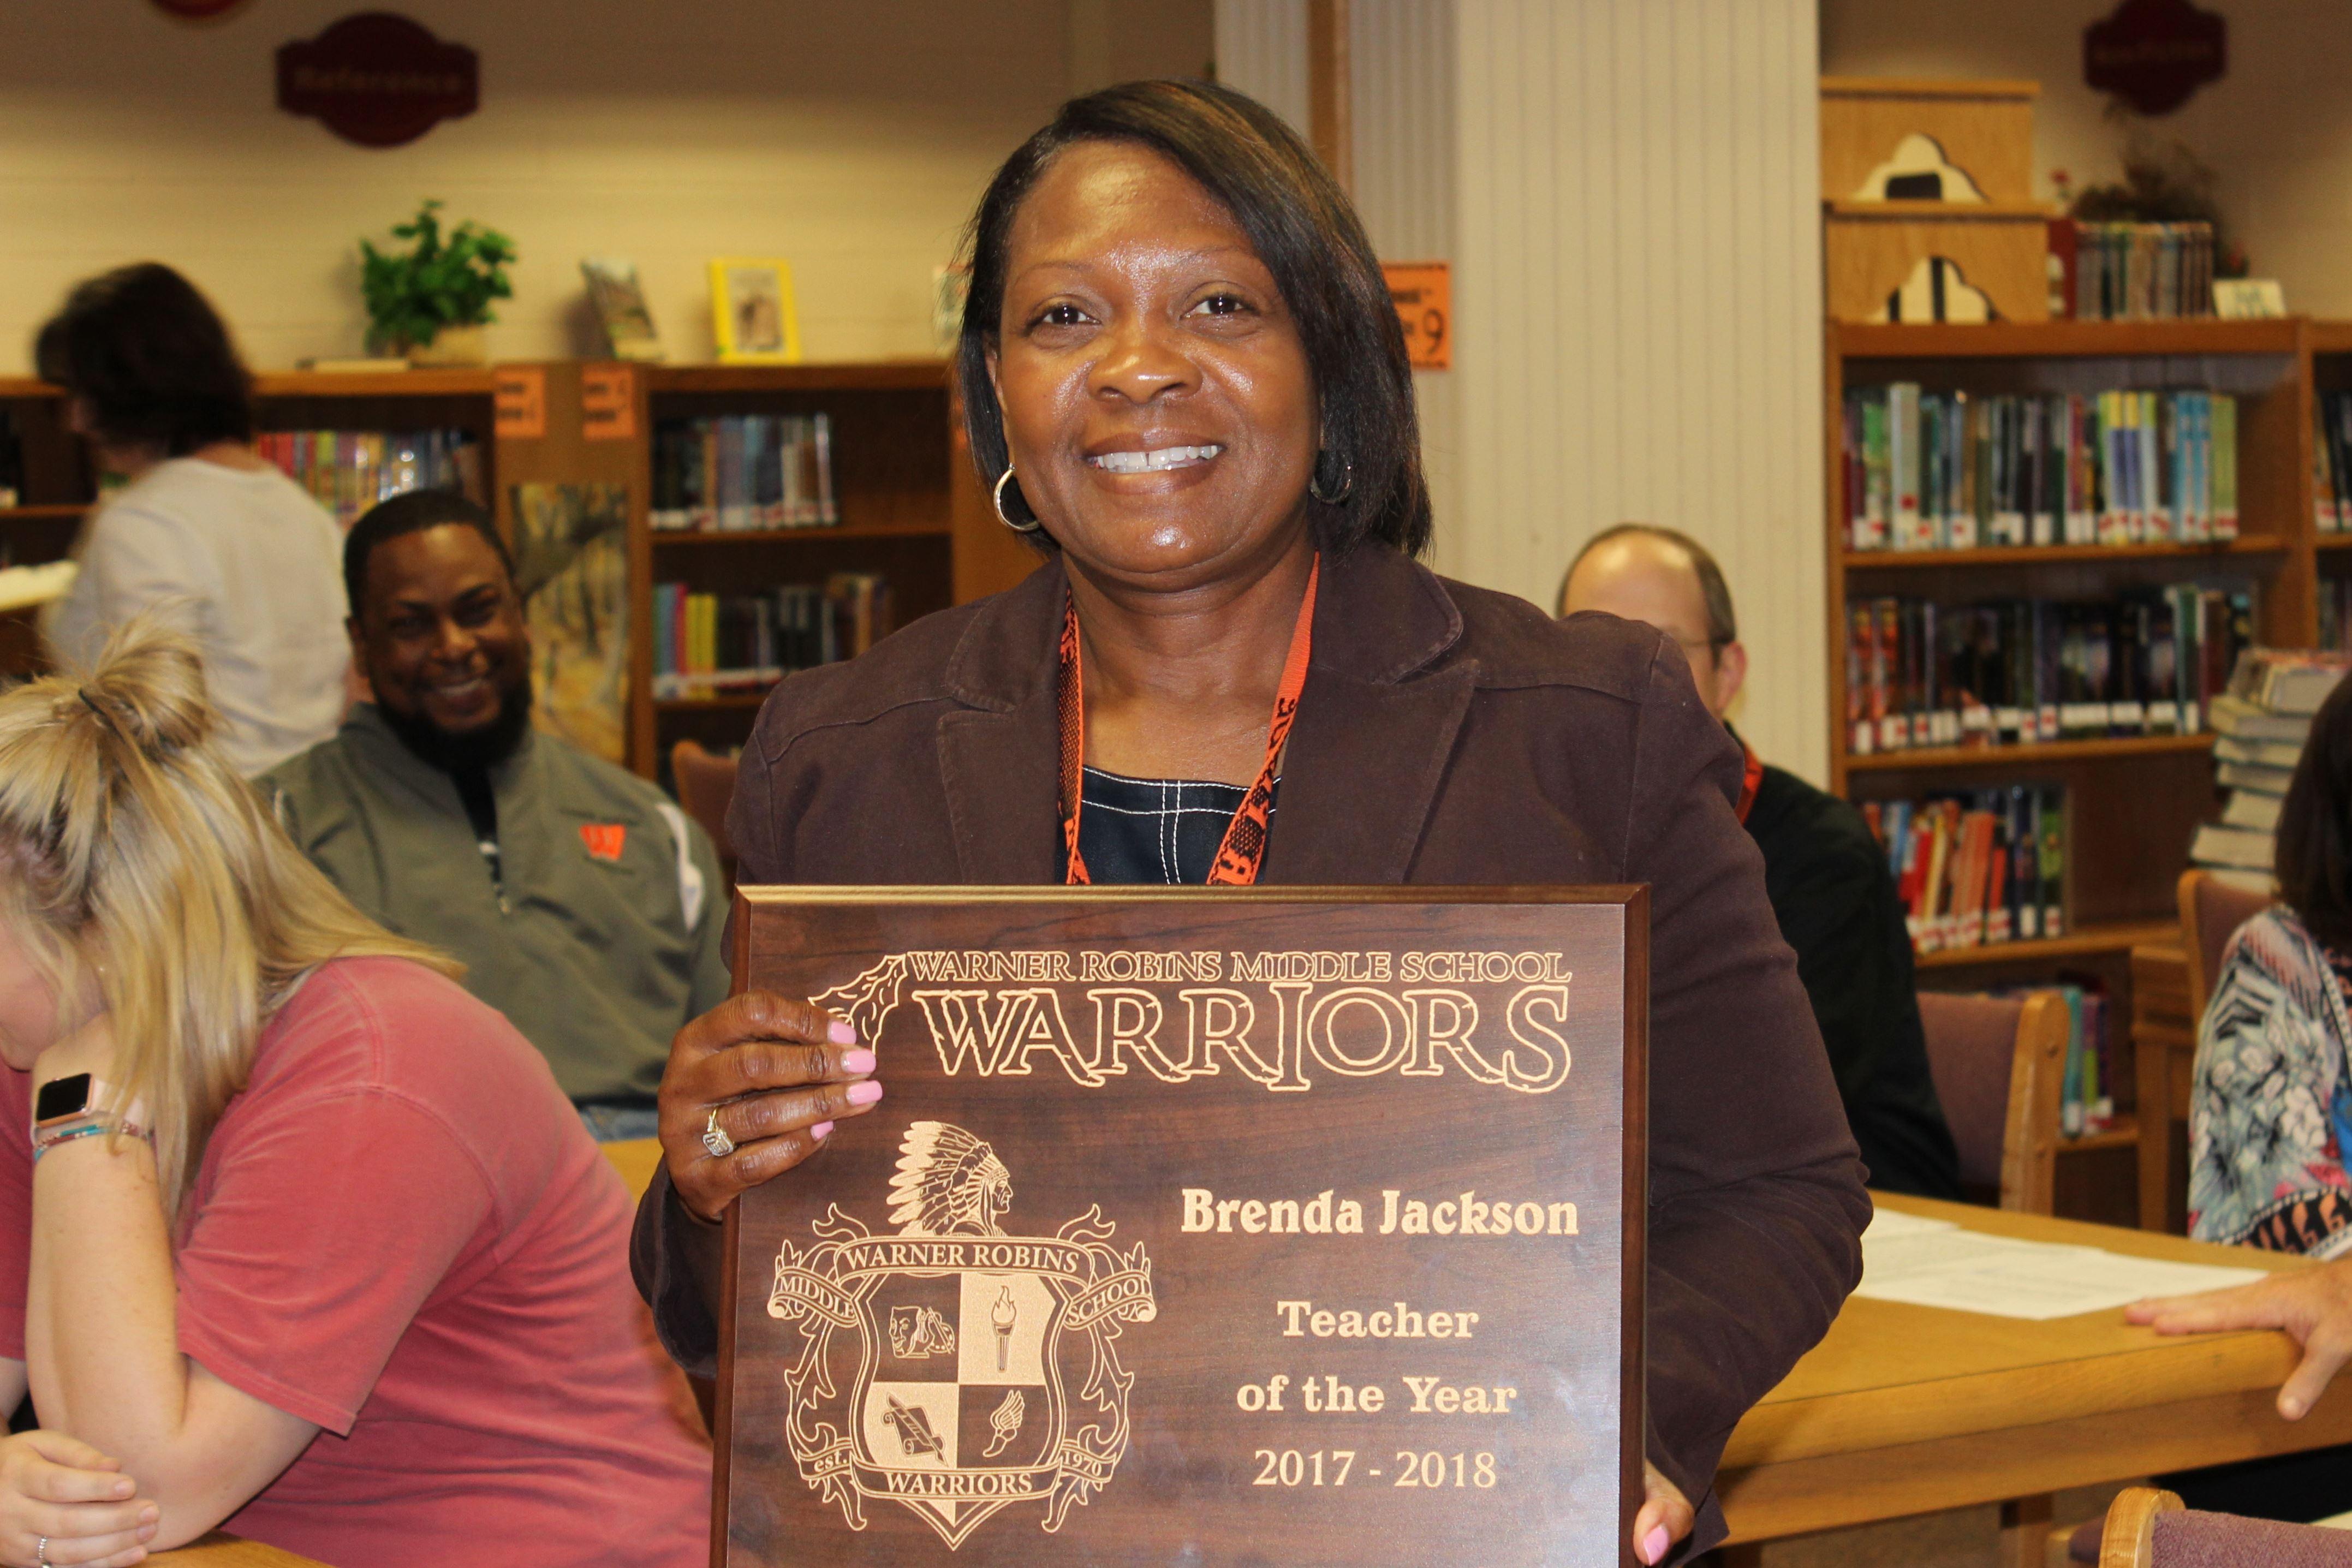 Mrs. Brenda Jackson